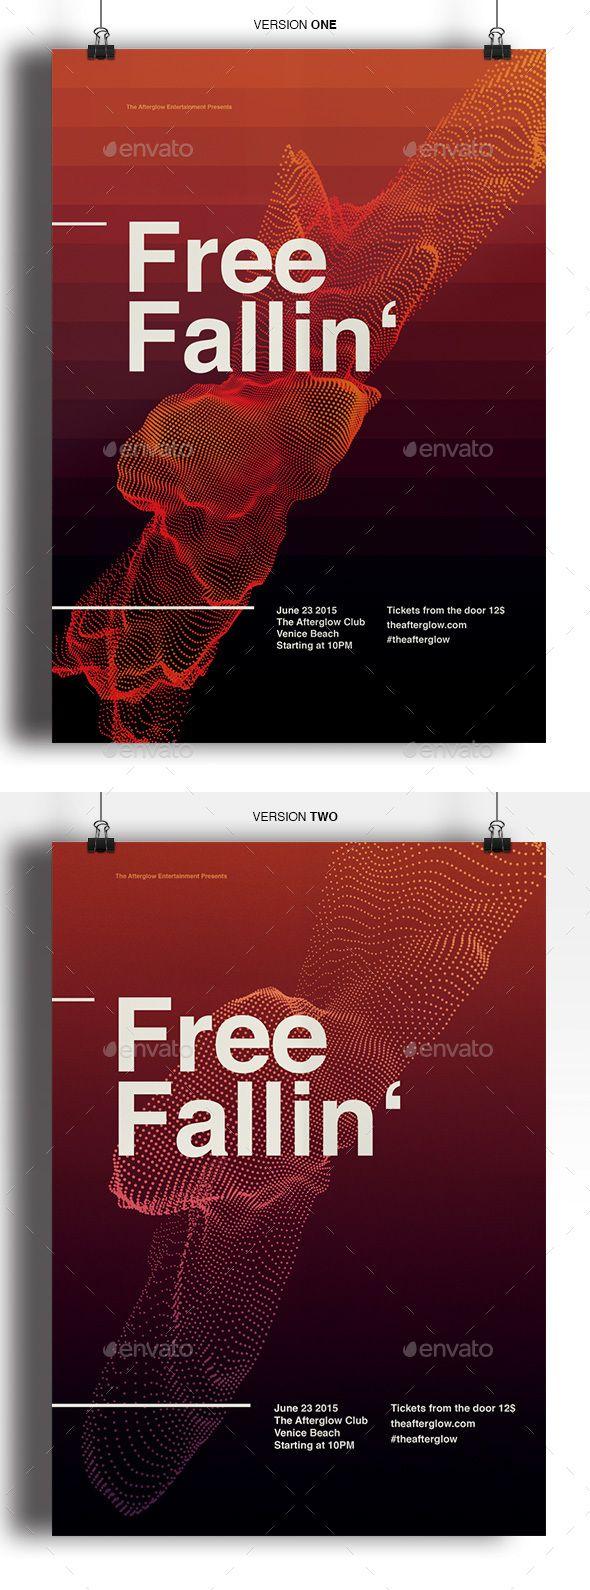 Best 25+ Free flyer maker ideas on Pinterest | Online flyer maker ...